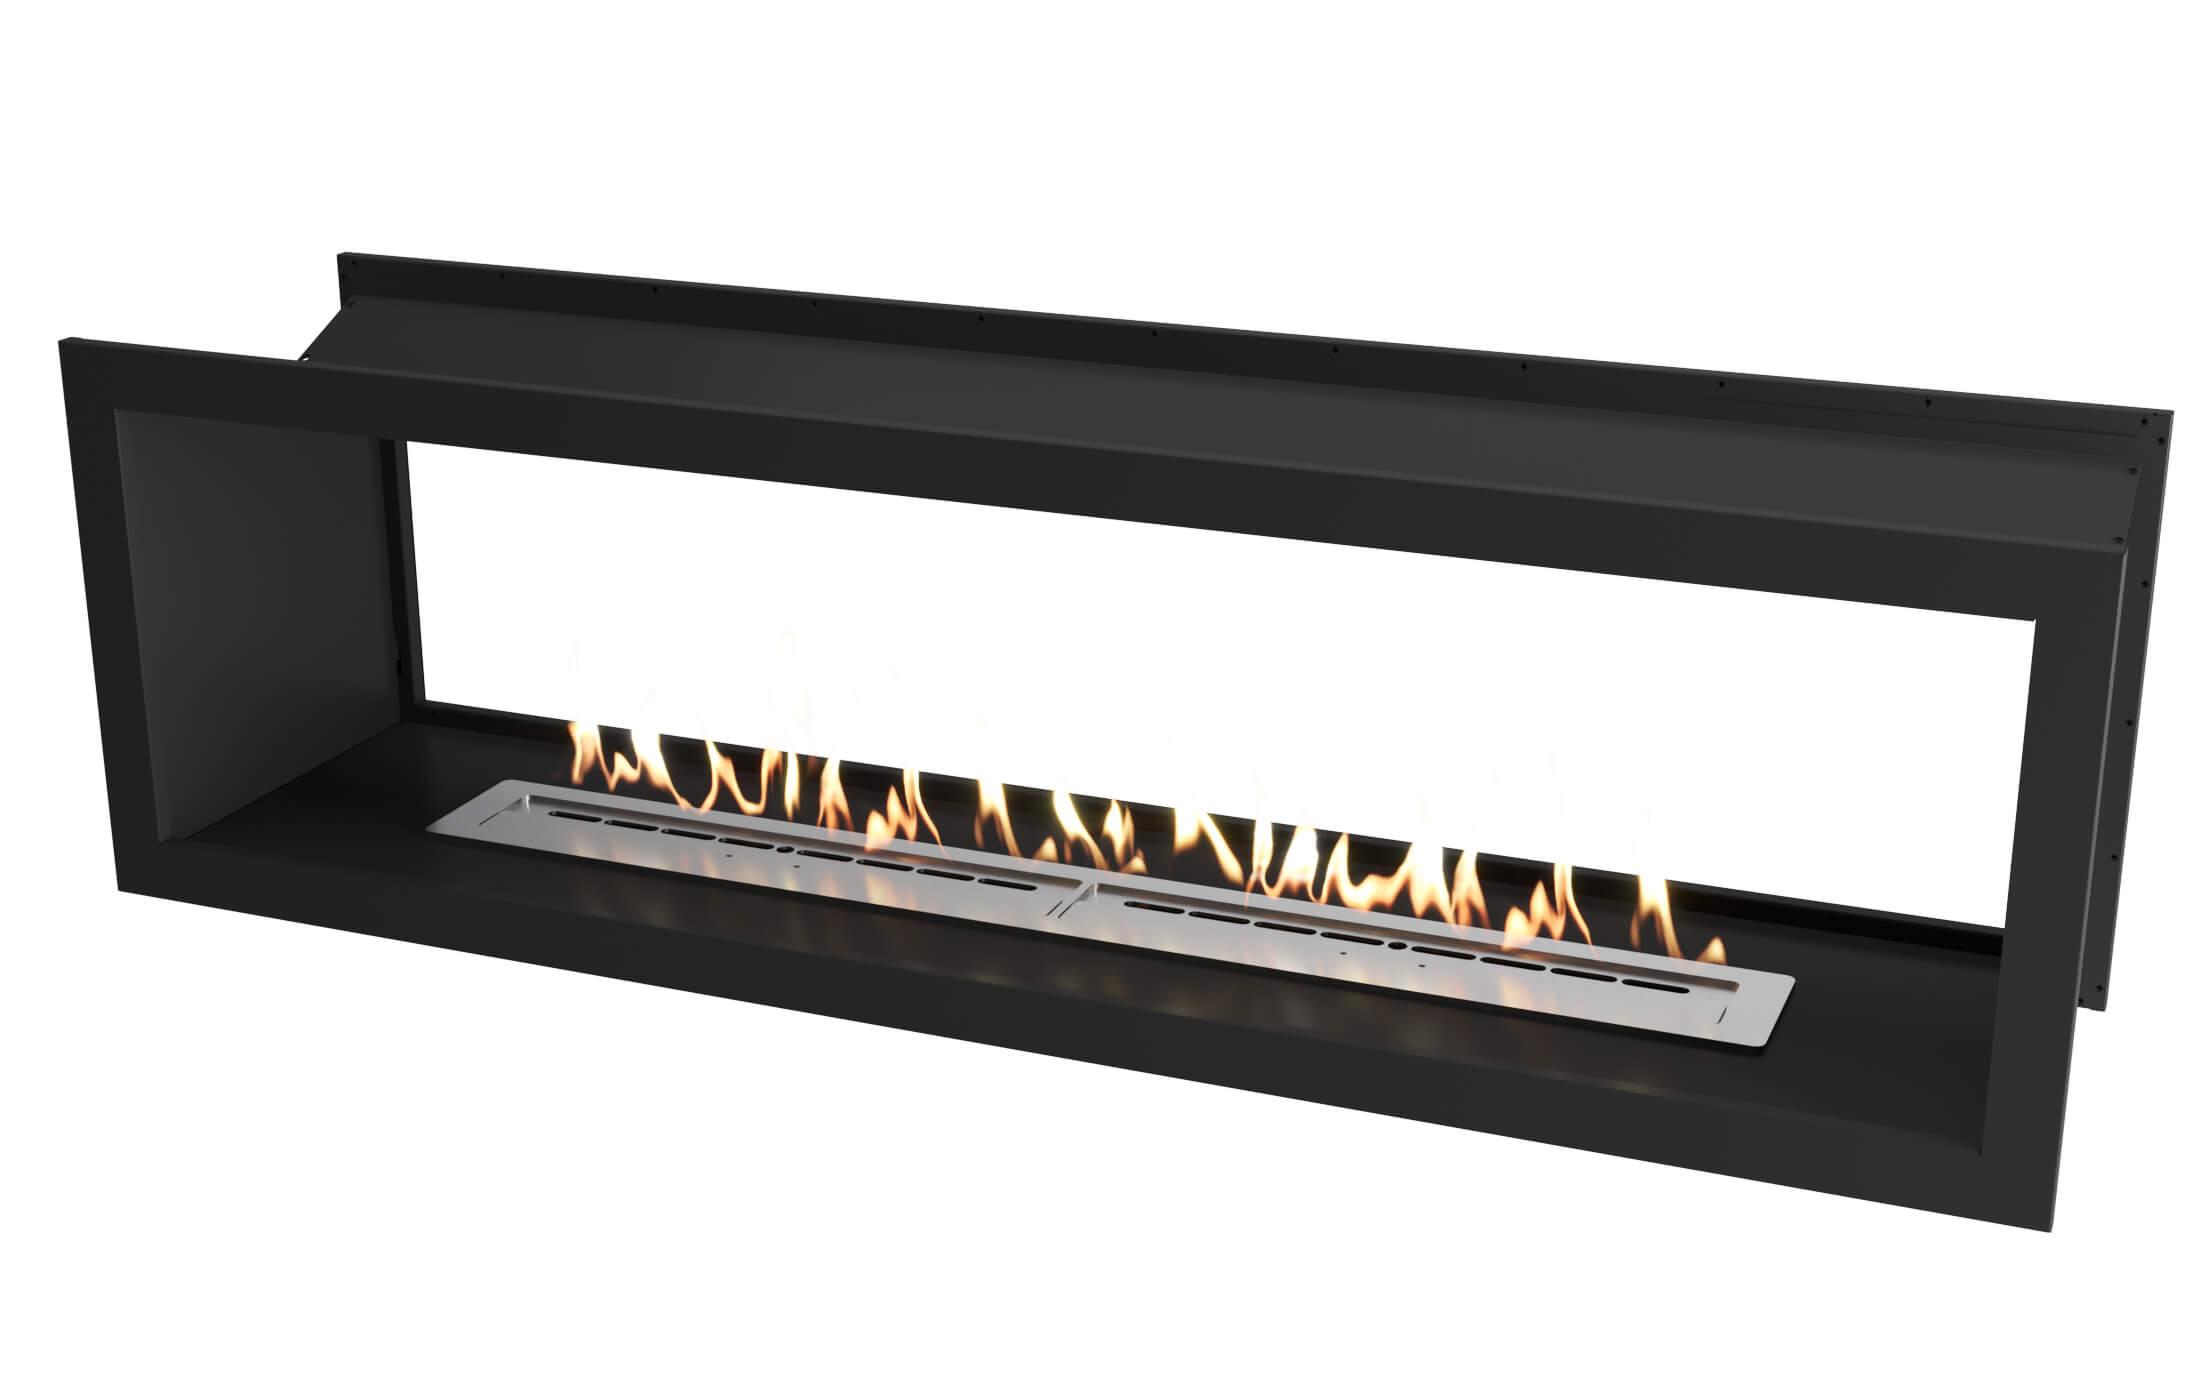 2000 Black double sided firebox with dual 800 slimline bio fuel burners